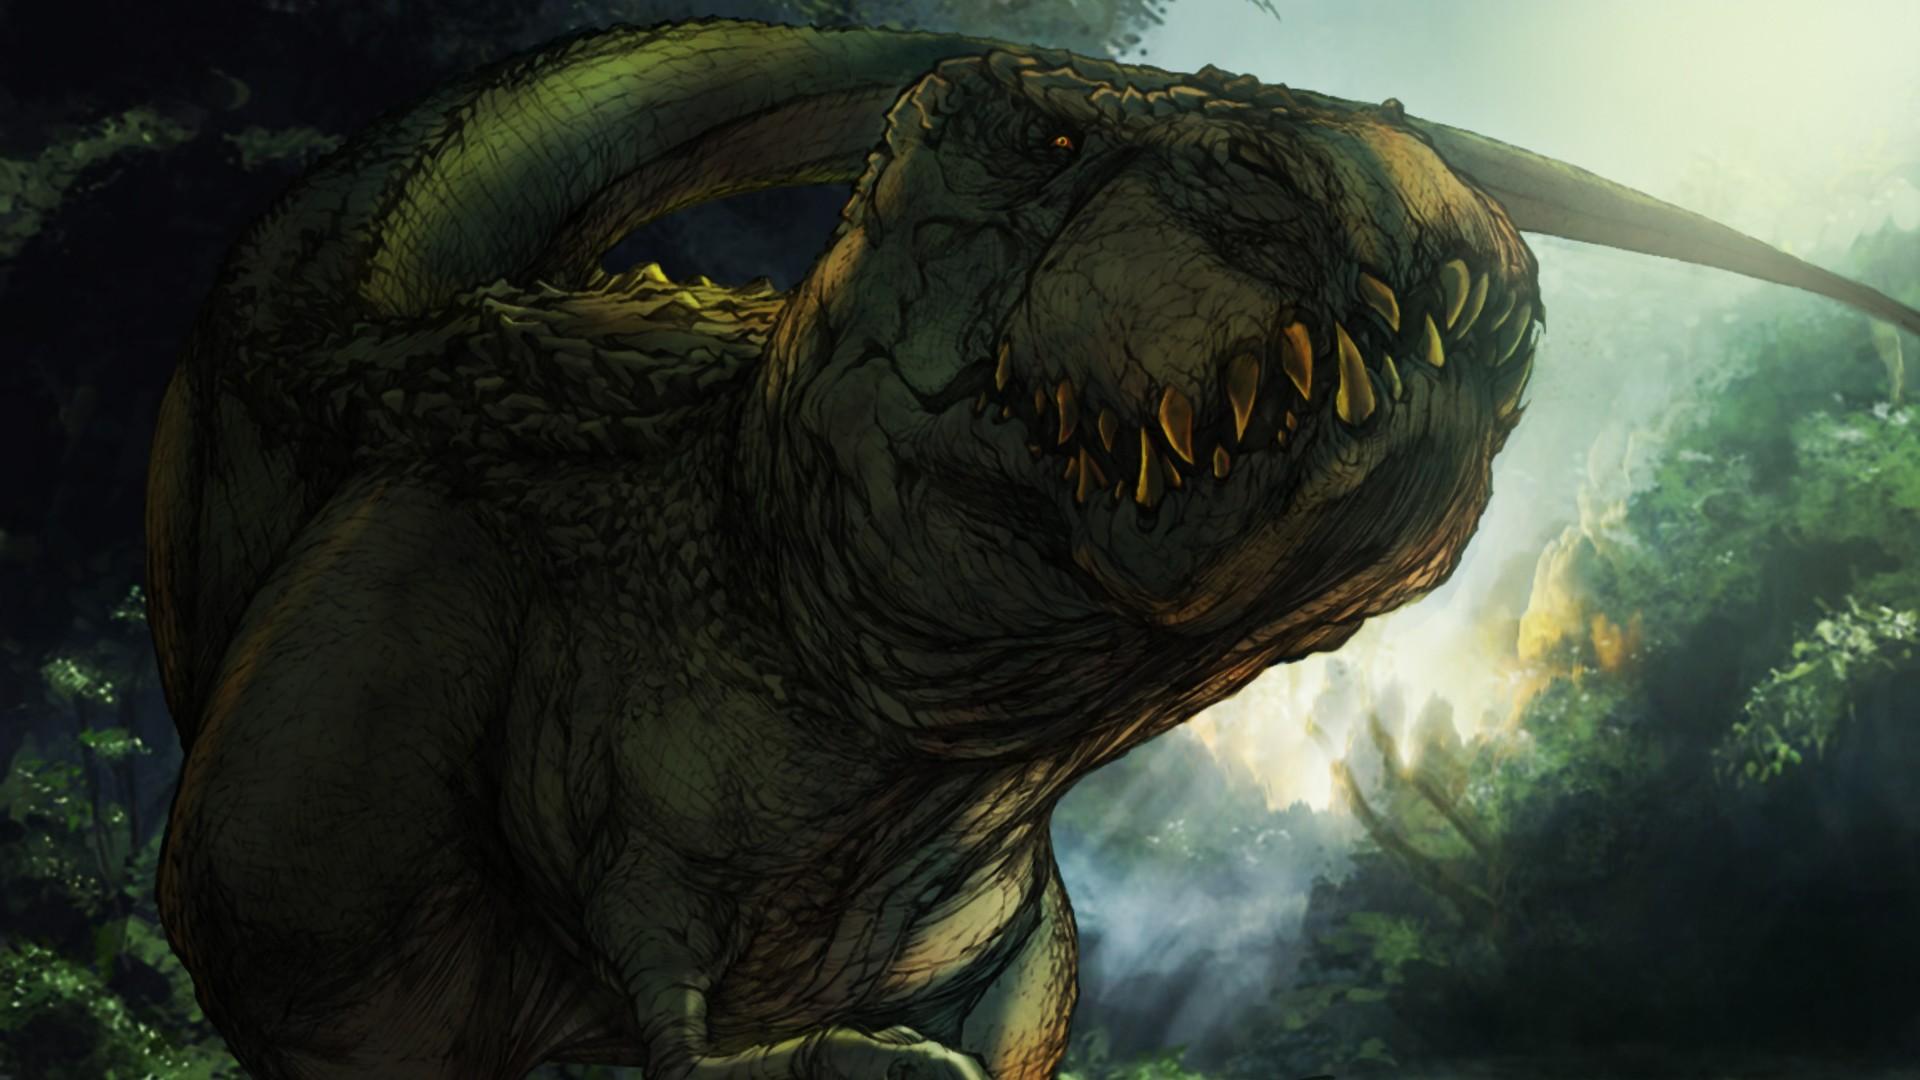 t rex illustration wallpaper background 1920x1080